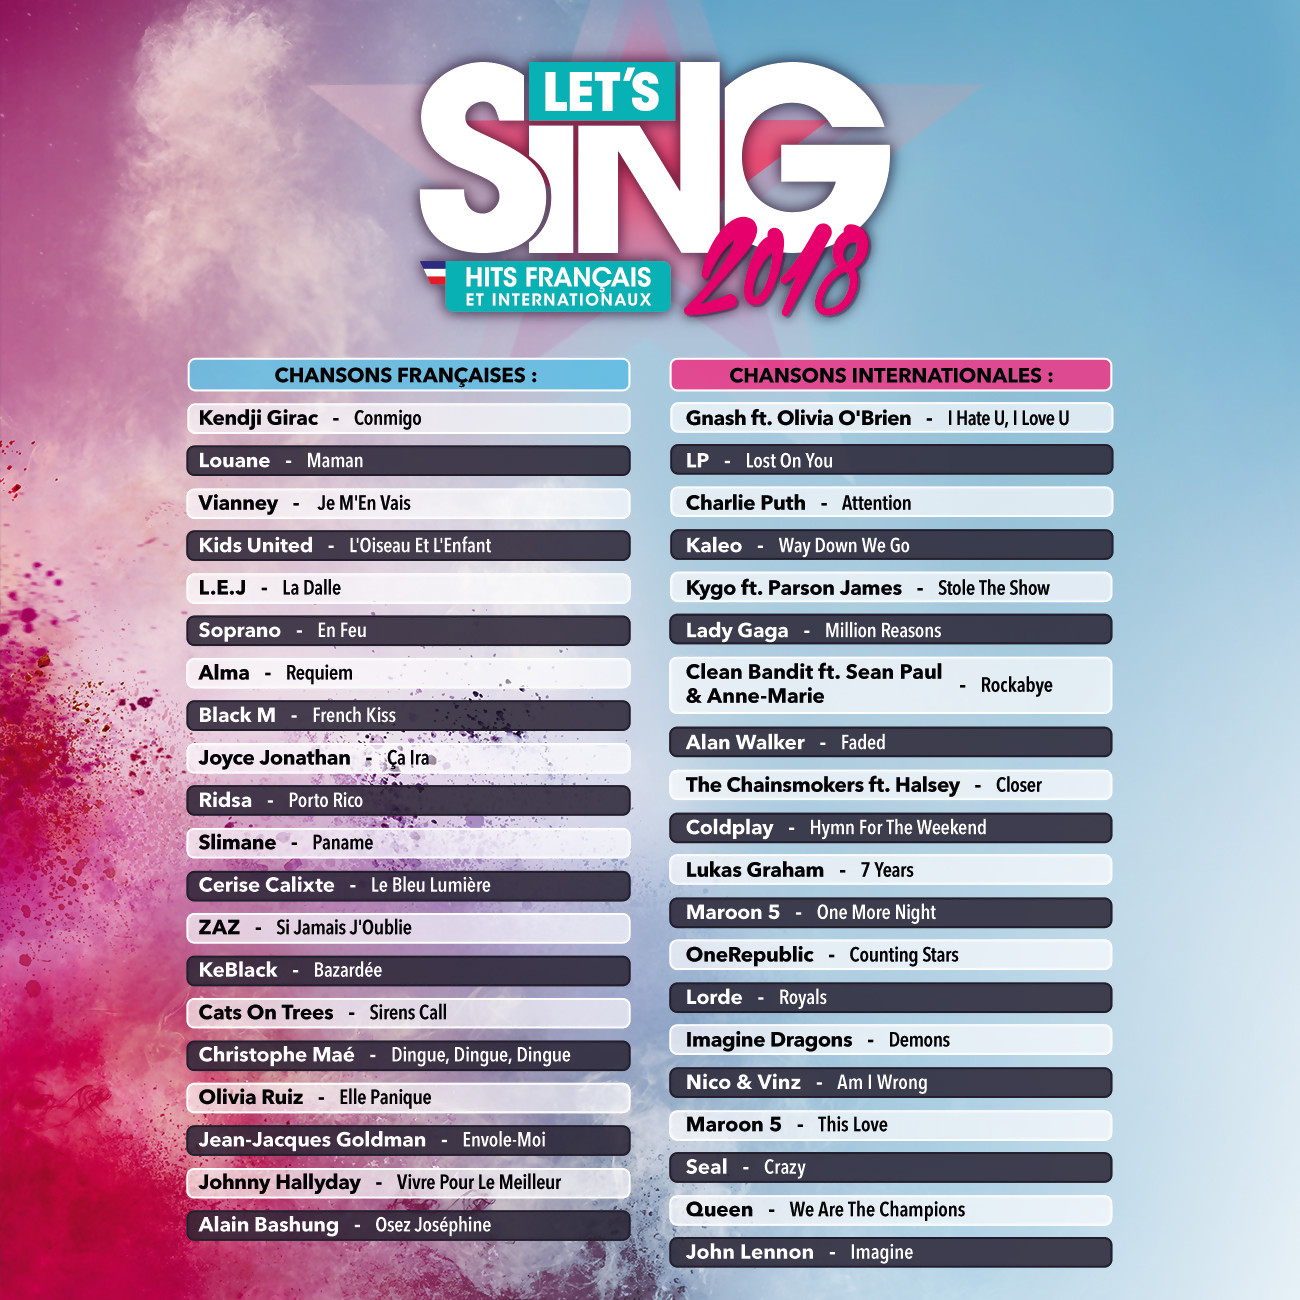 chanson singstar gratuite